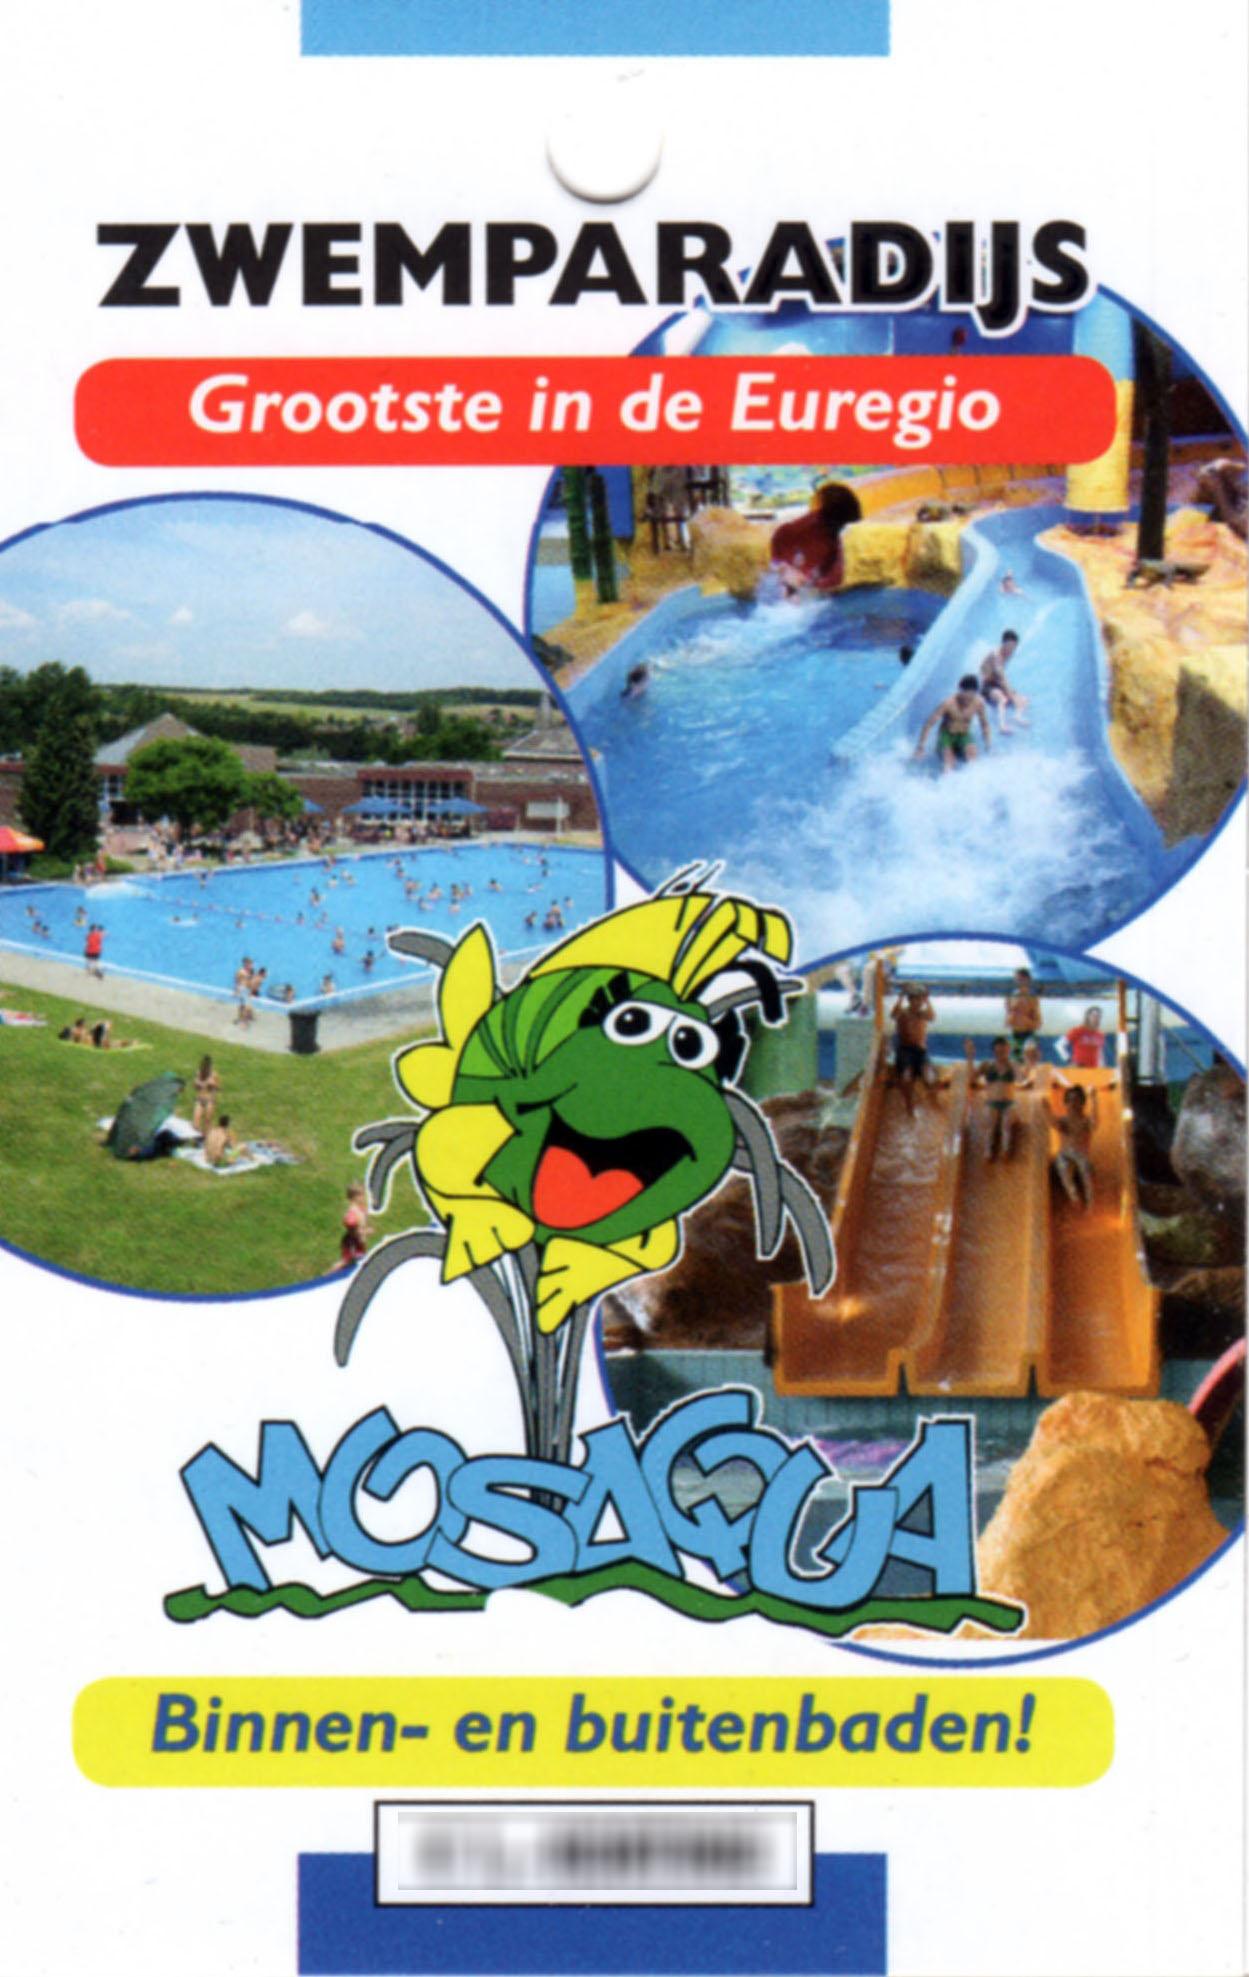 Mosaqua zwemparadijs